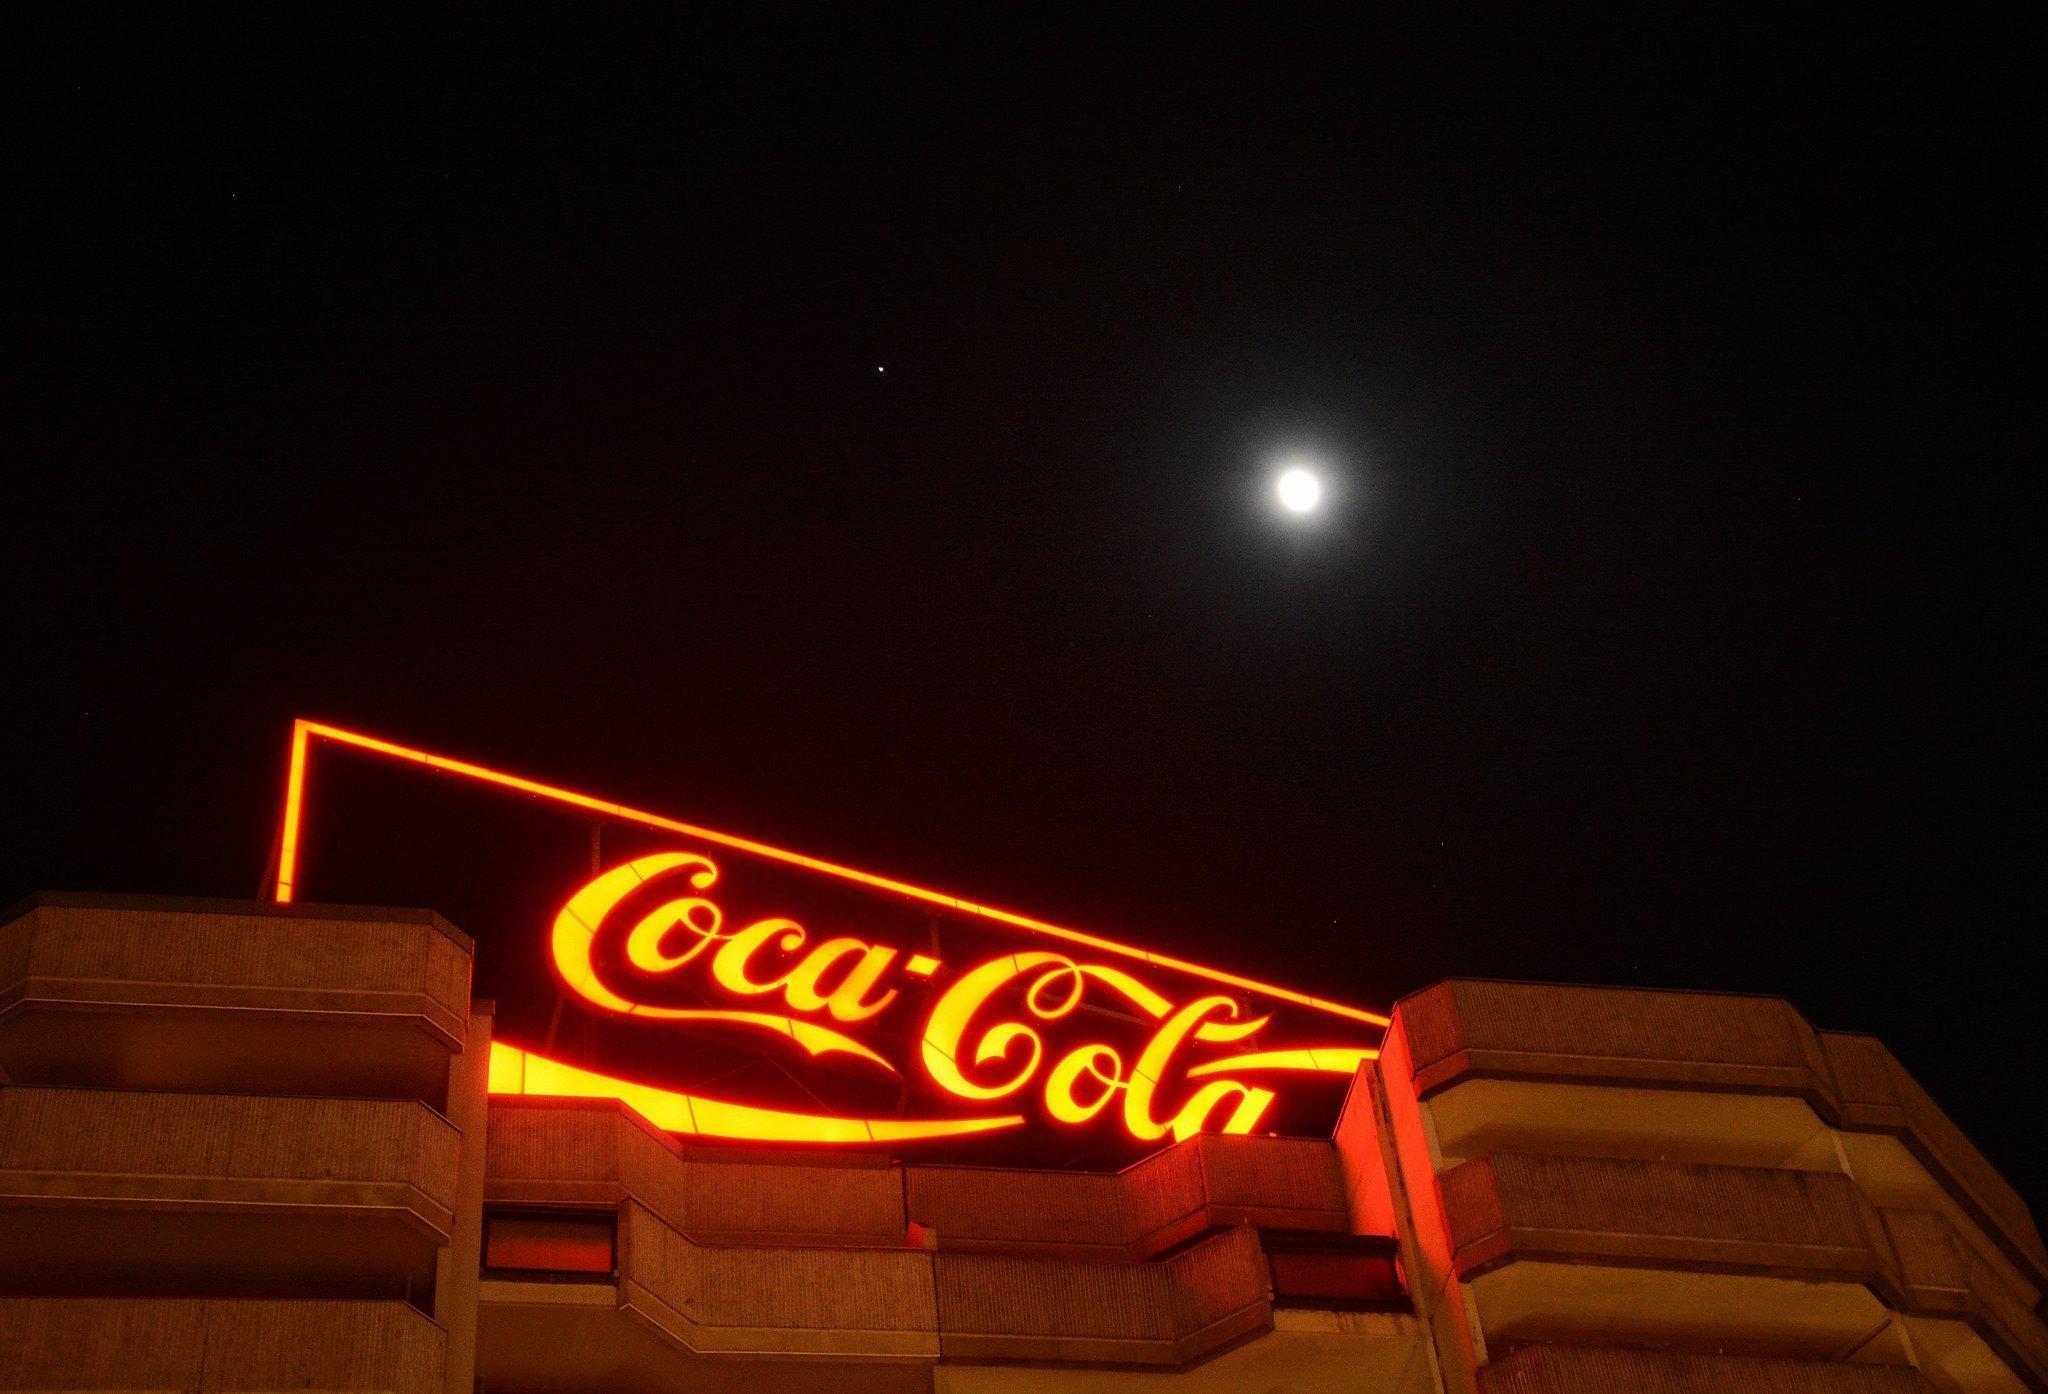 coca cola tafel spitteleck berlin nachts mond